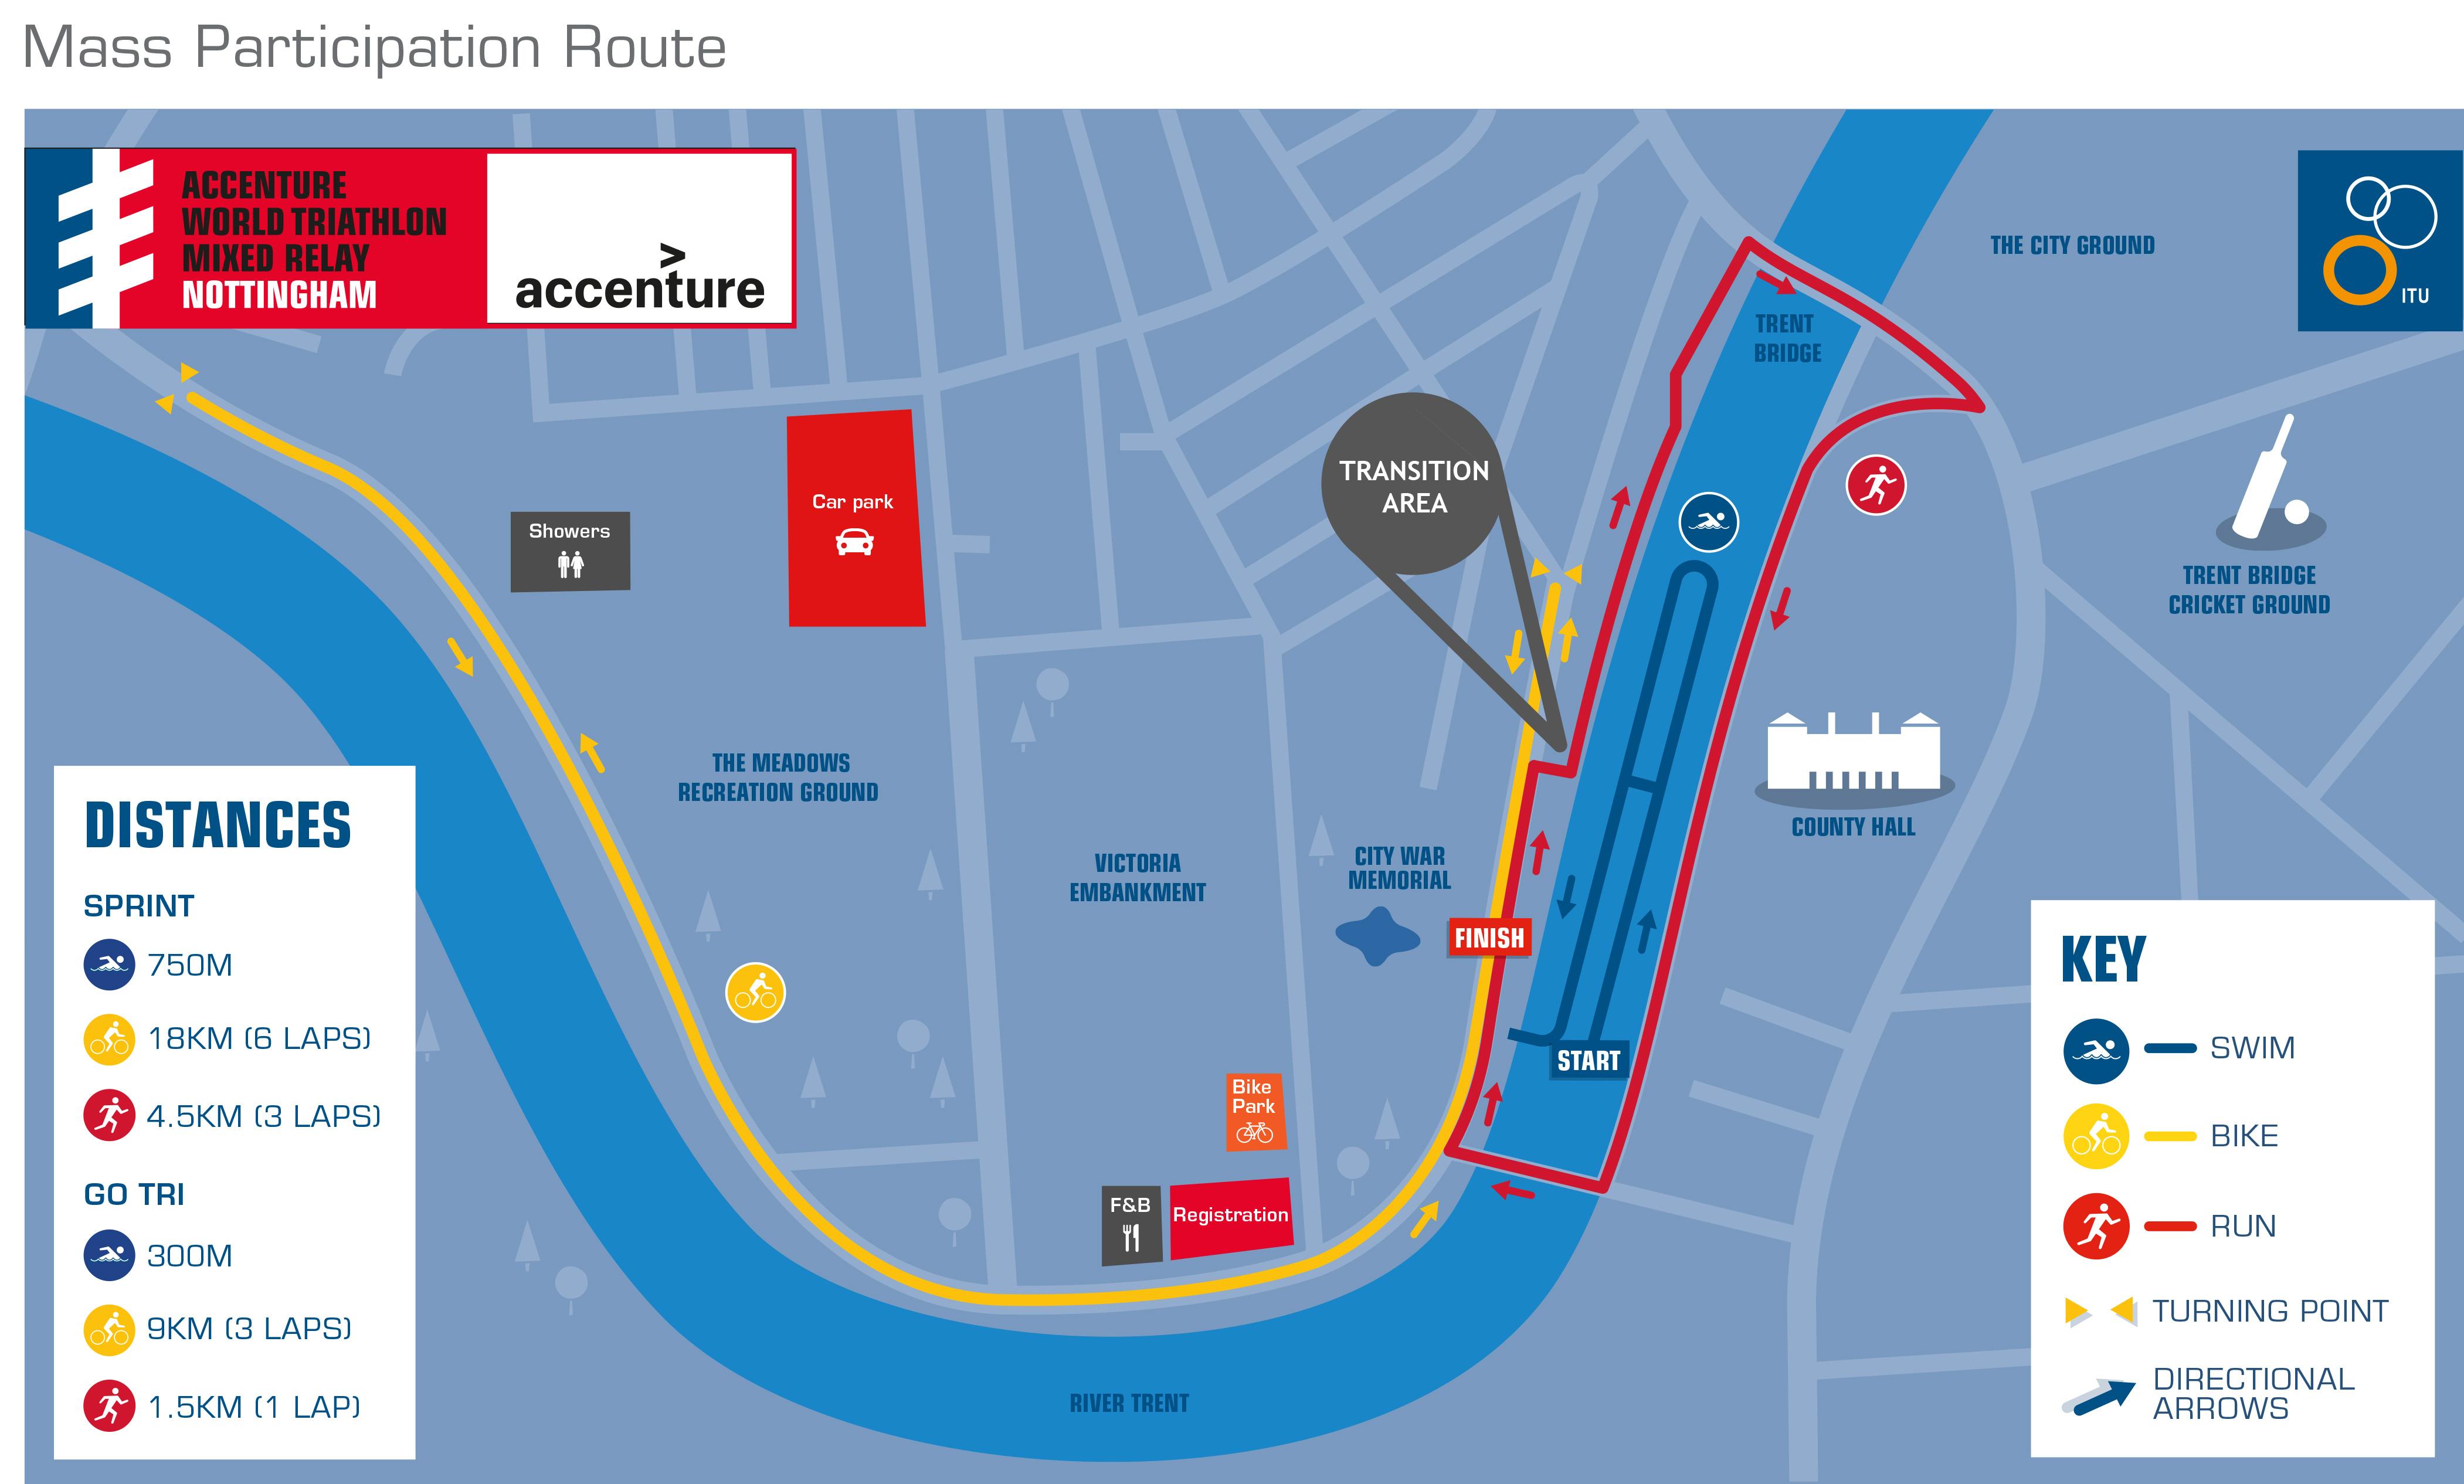 Course Maps - Accenture World Triathlon Mixed Relay Nottingham